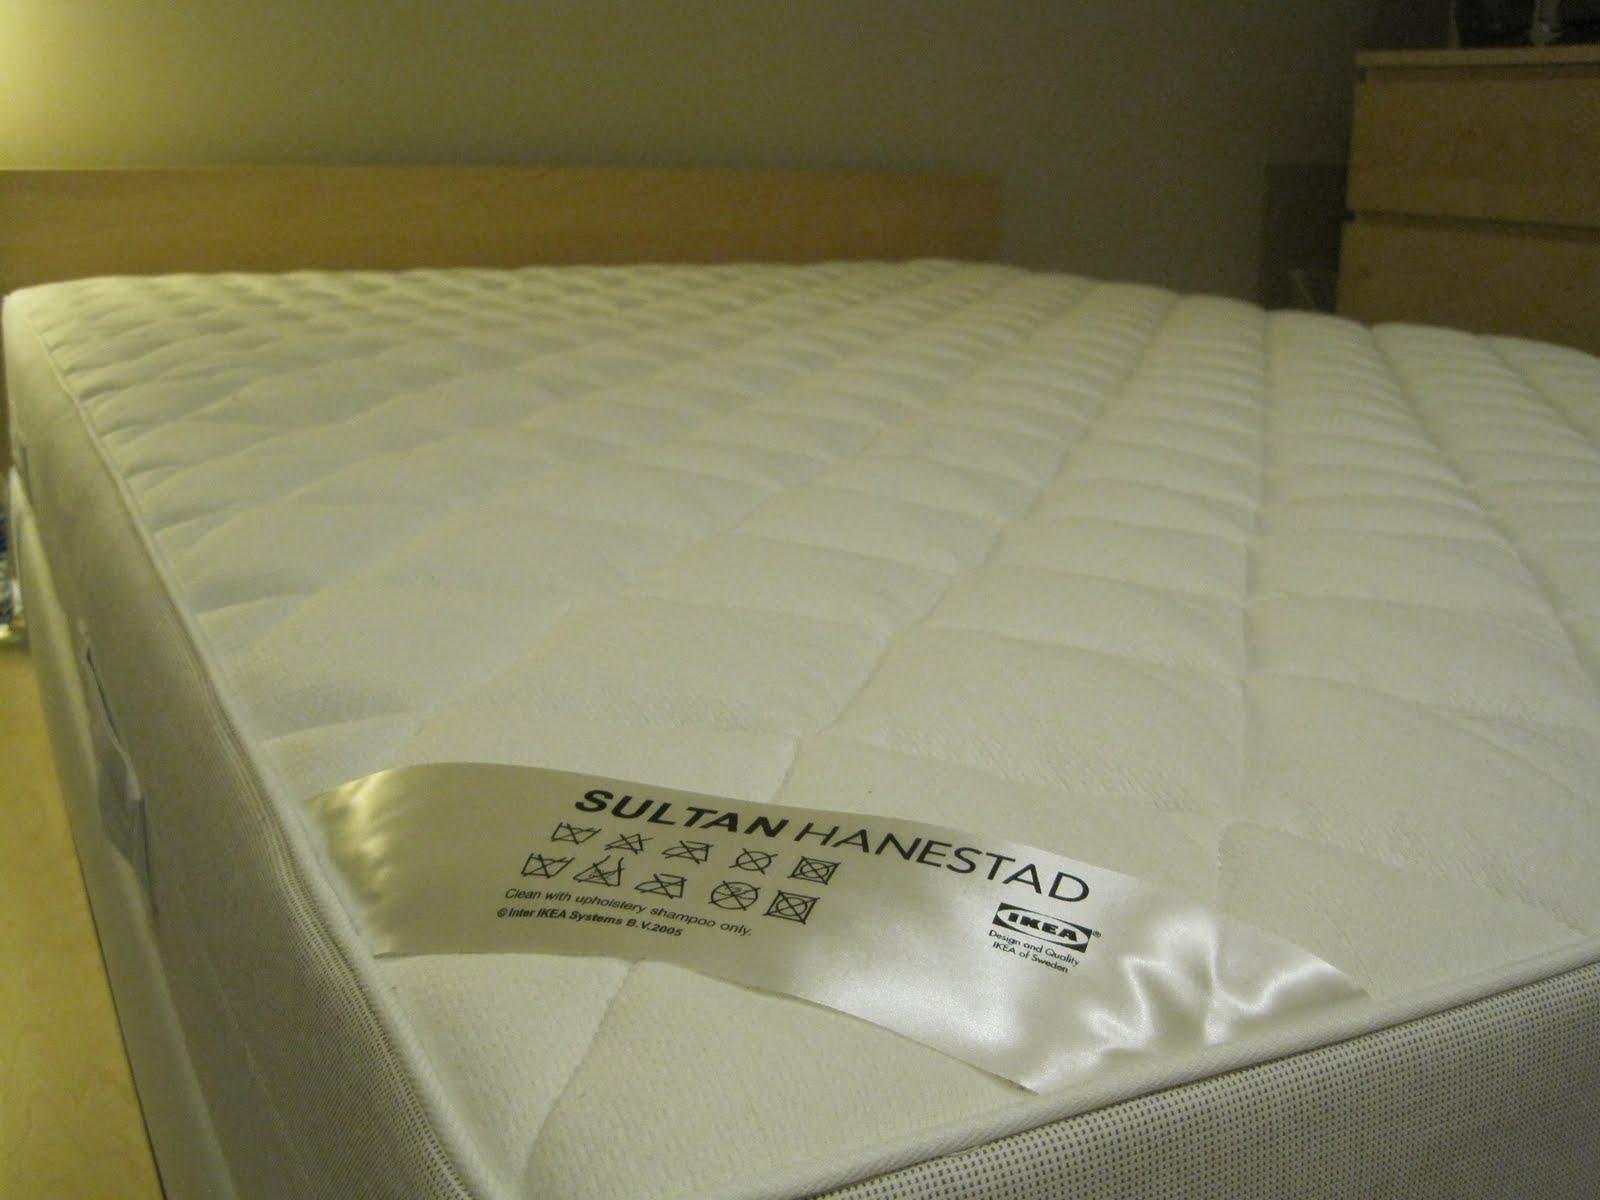 ikea mattress. Black Bedroom Furniture Sets. Home Design Ideas